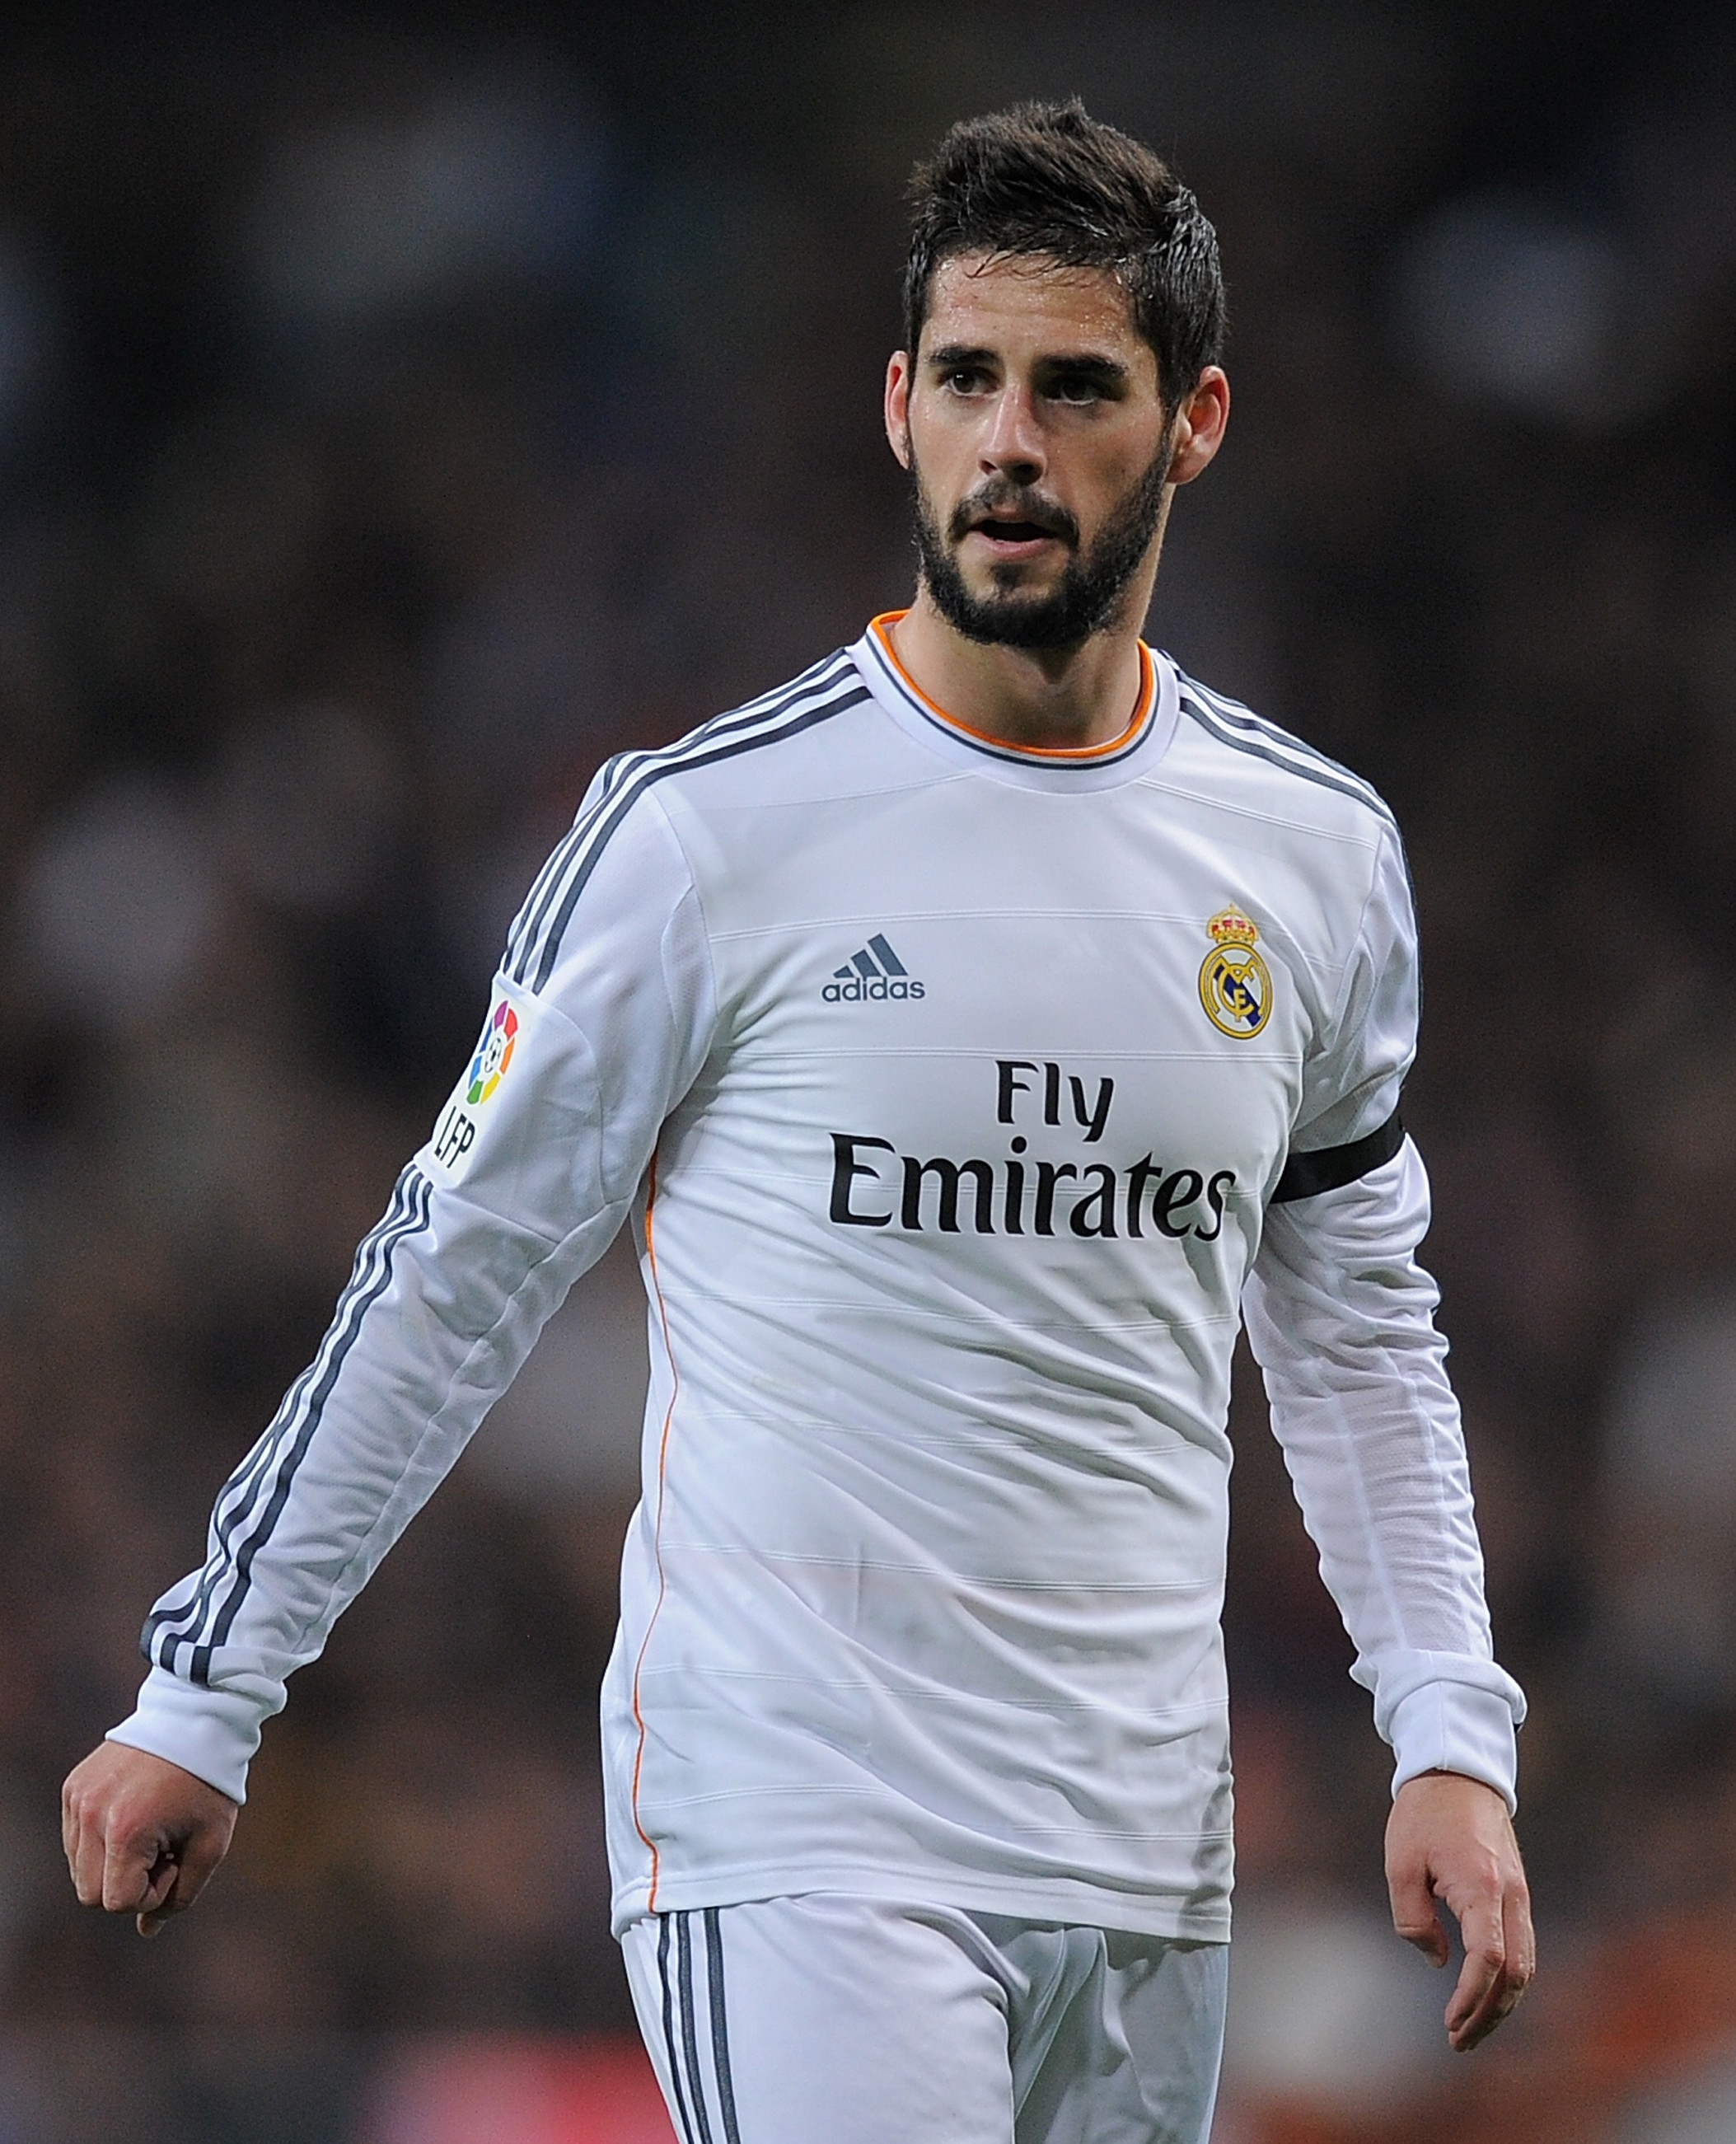 Real Madrid Wallpaper Full Hd Isco Wallpapers Hd